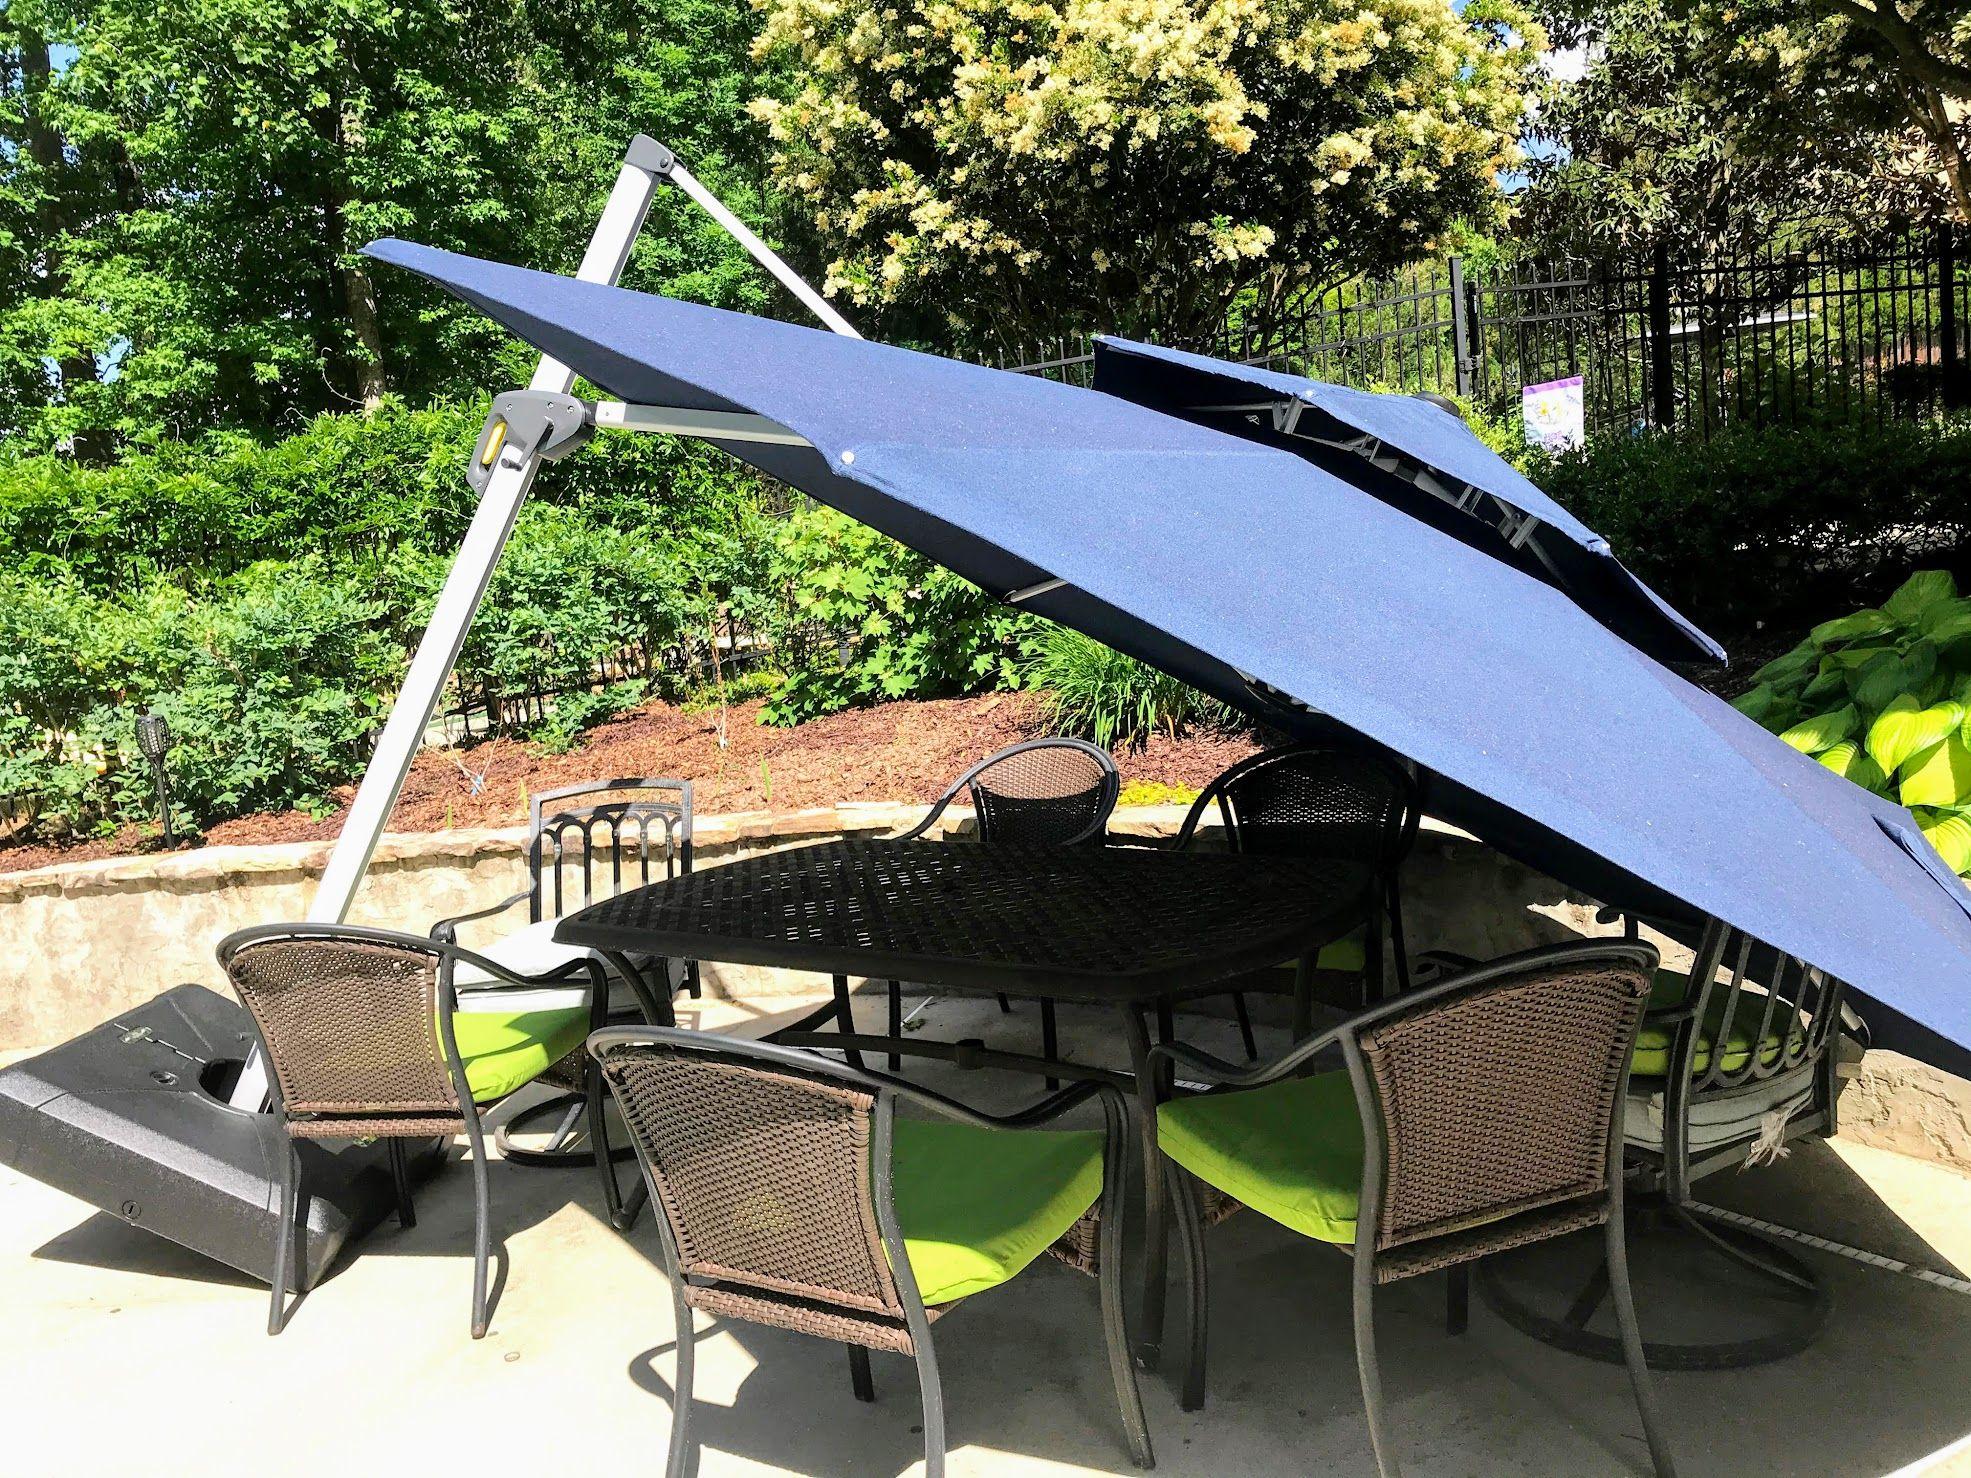 Cantilever Patio Umbrella Guide To Windproofing In 2020 Best Patio Umbrella Patio Patio Umbrellas